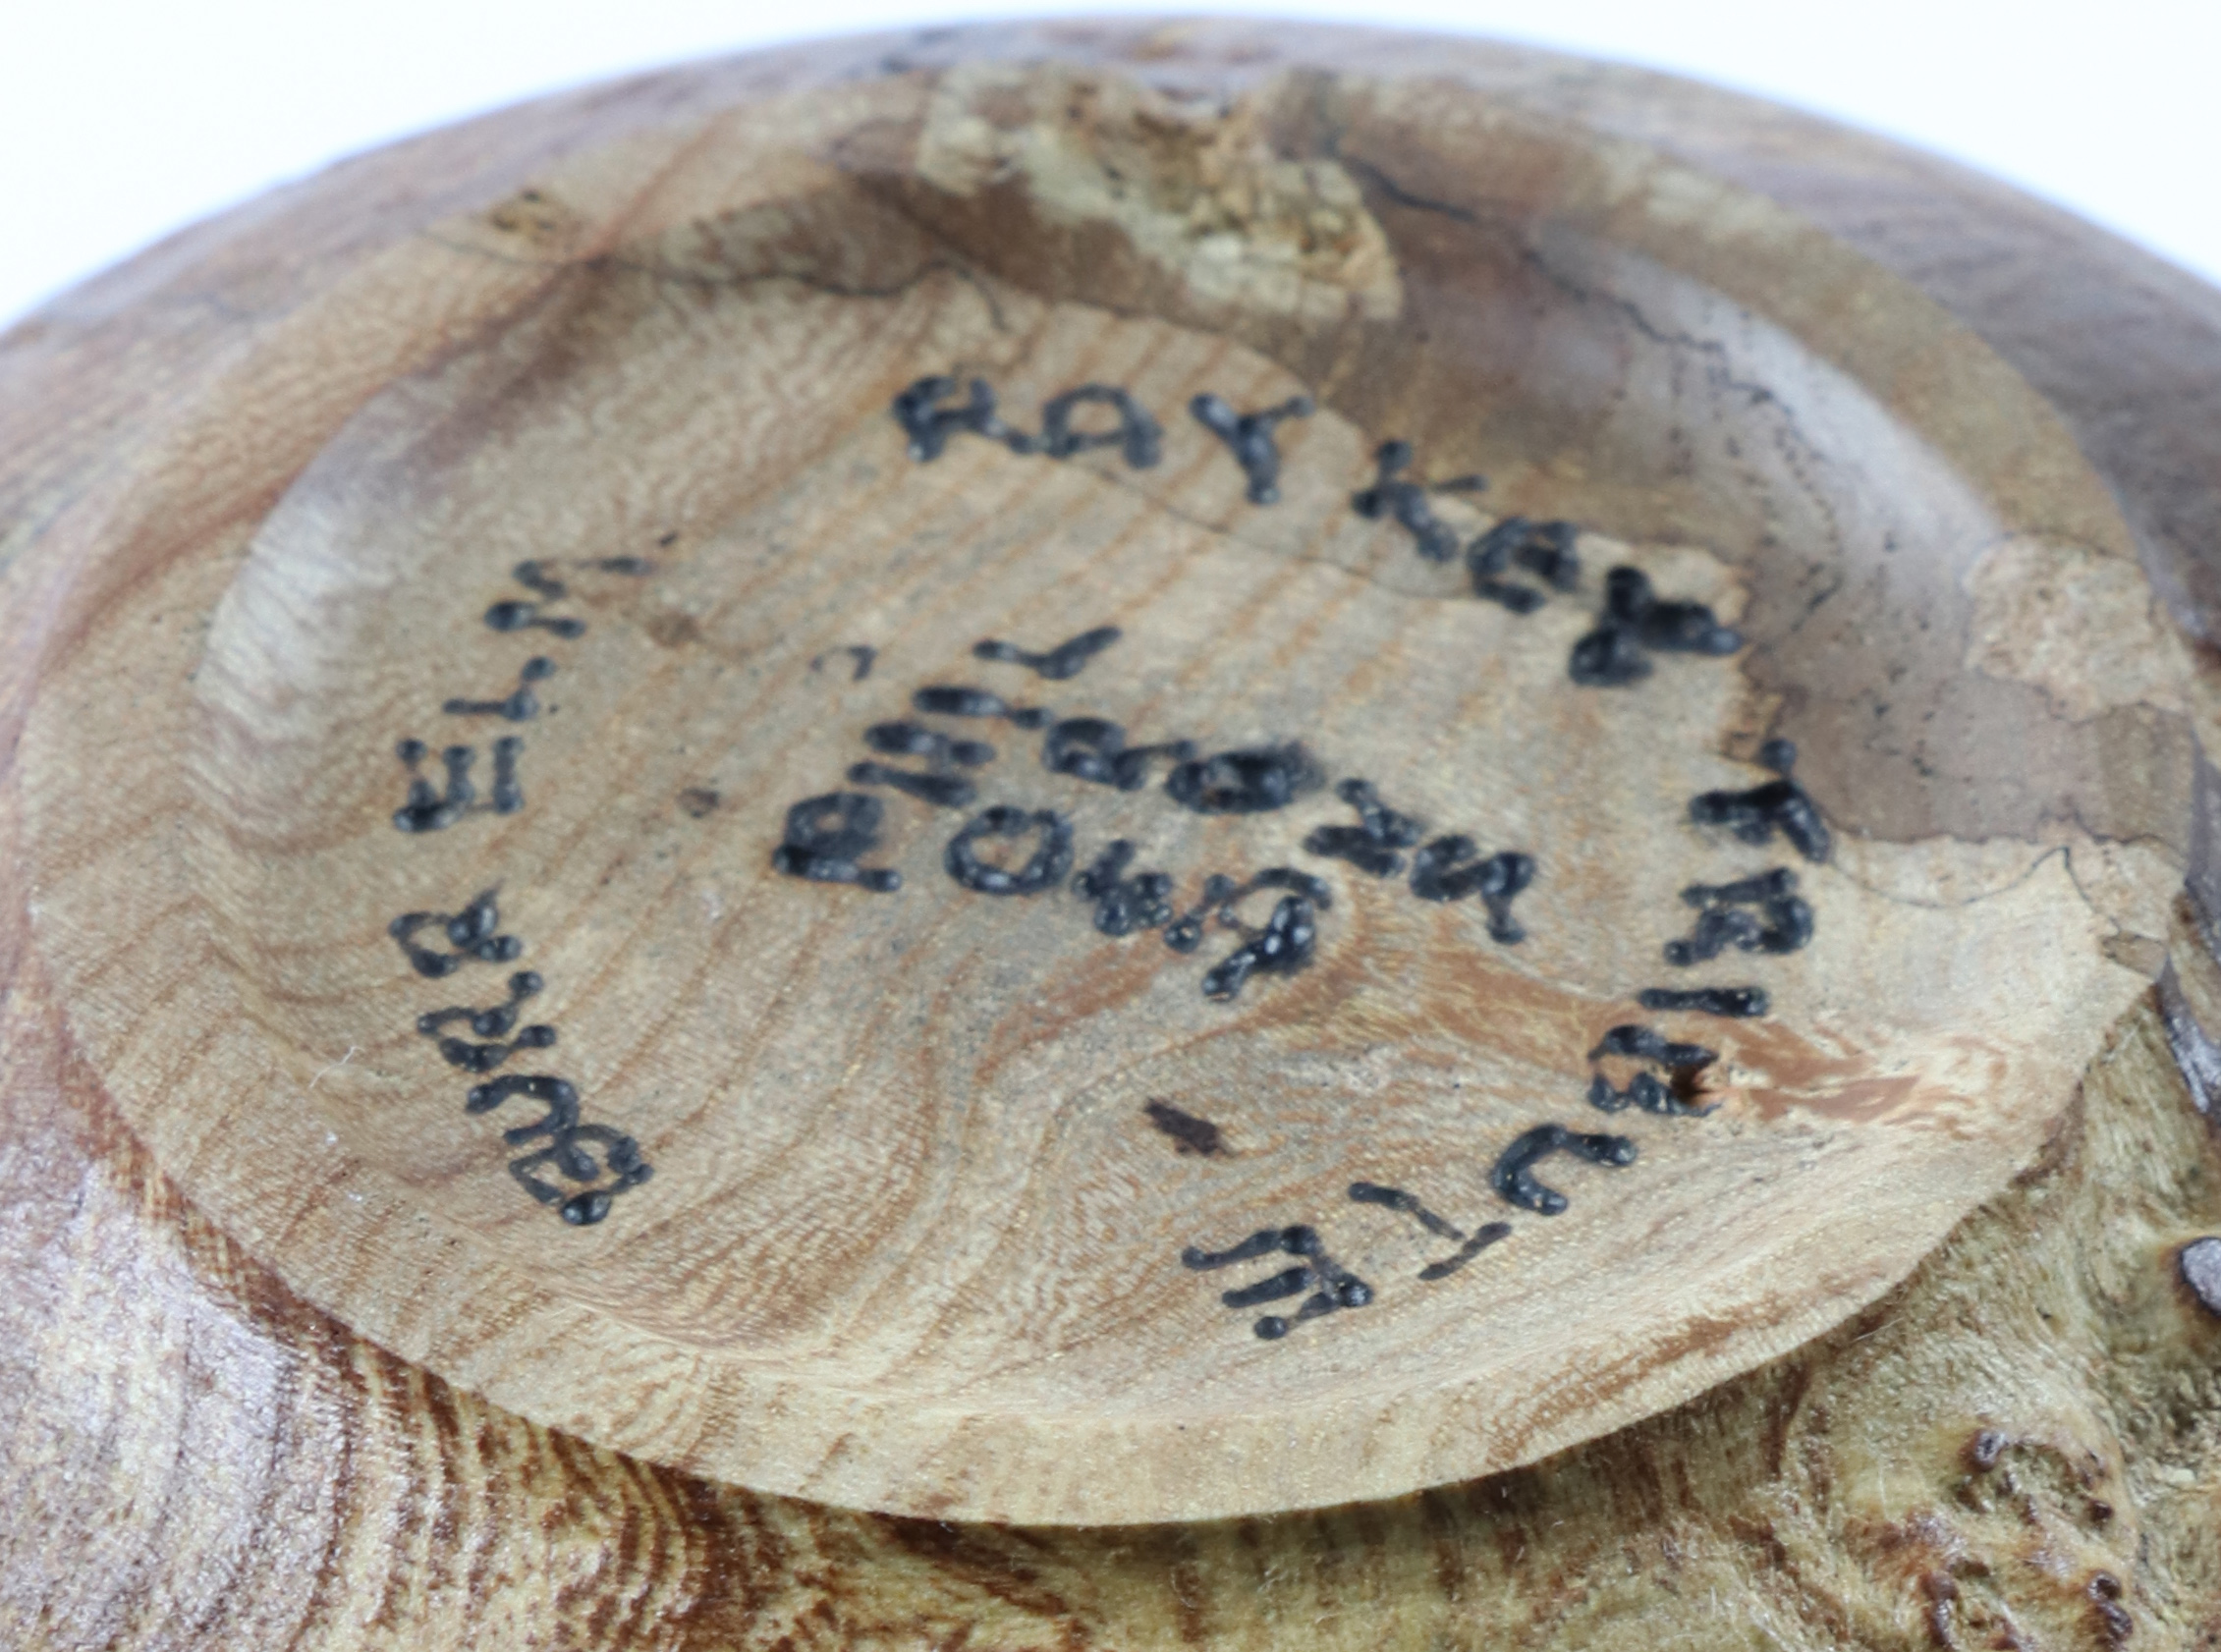 Lot 94 - Phil Irons (UK) textured burr elm hollow form 17x13cm. Signed